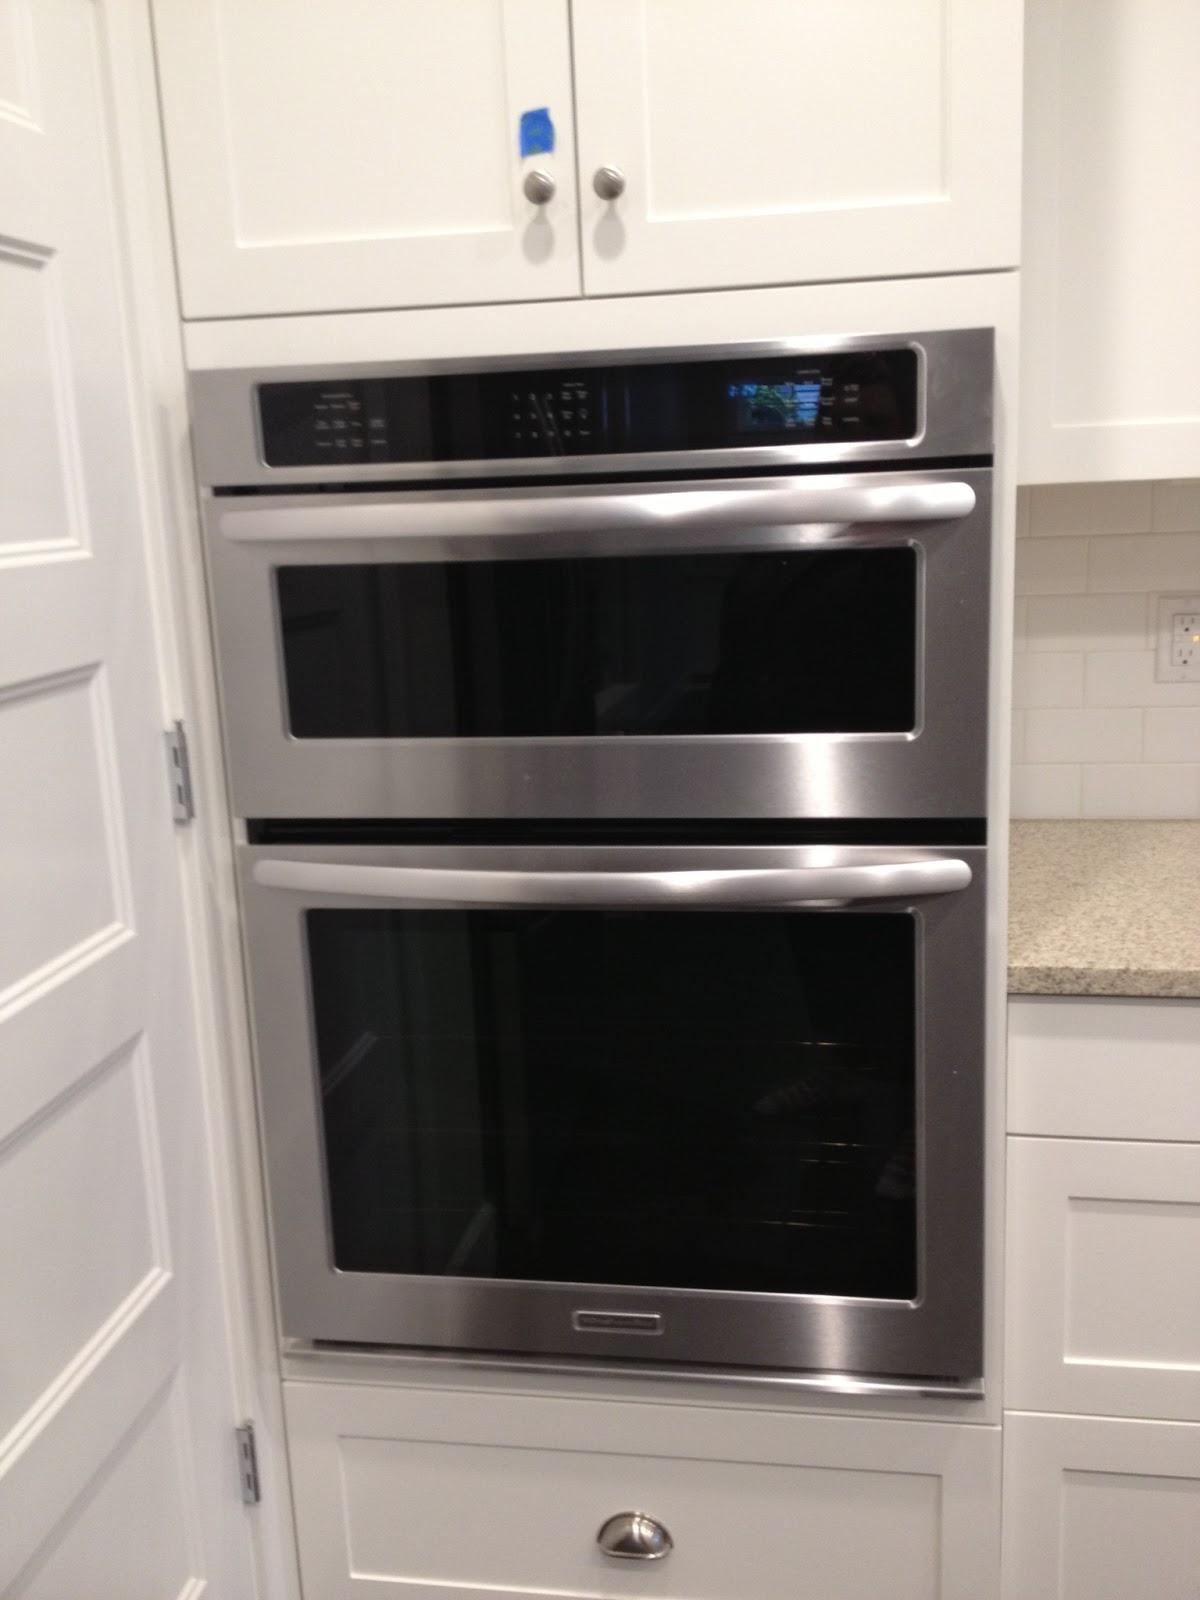 ... Kitchenaid Convection Microwave Ovens